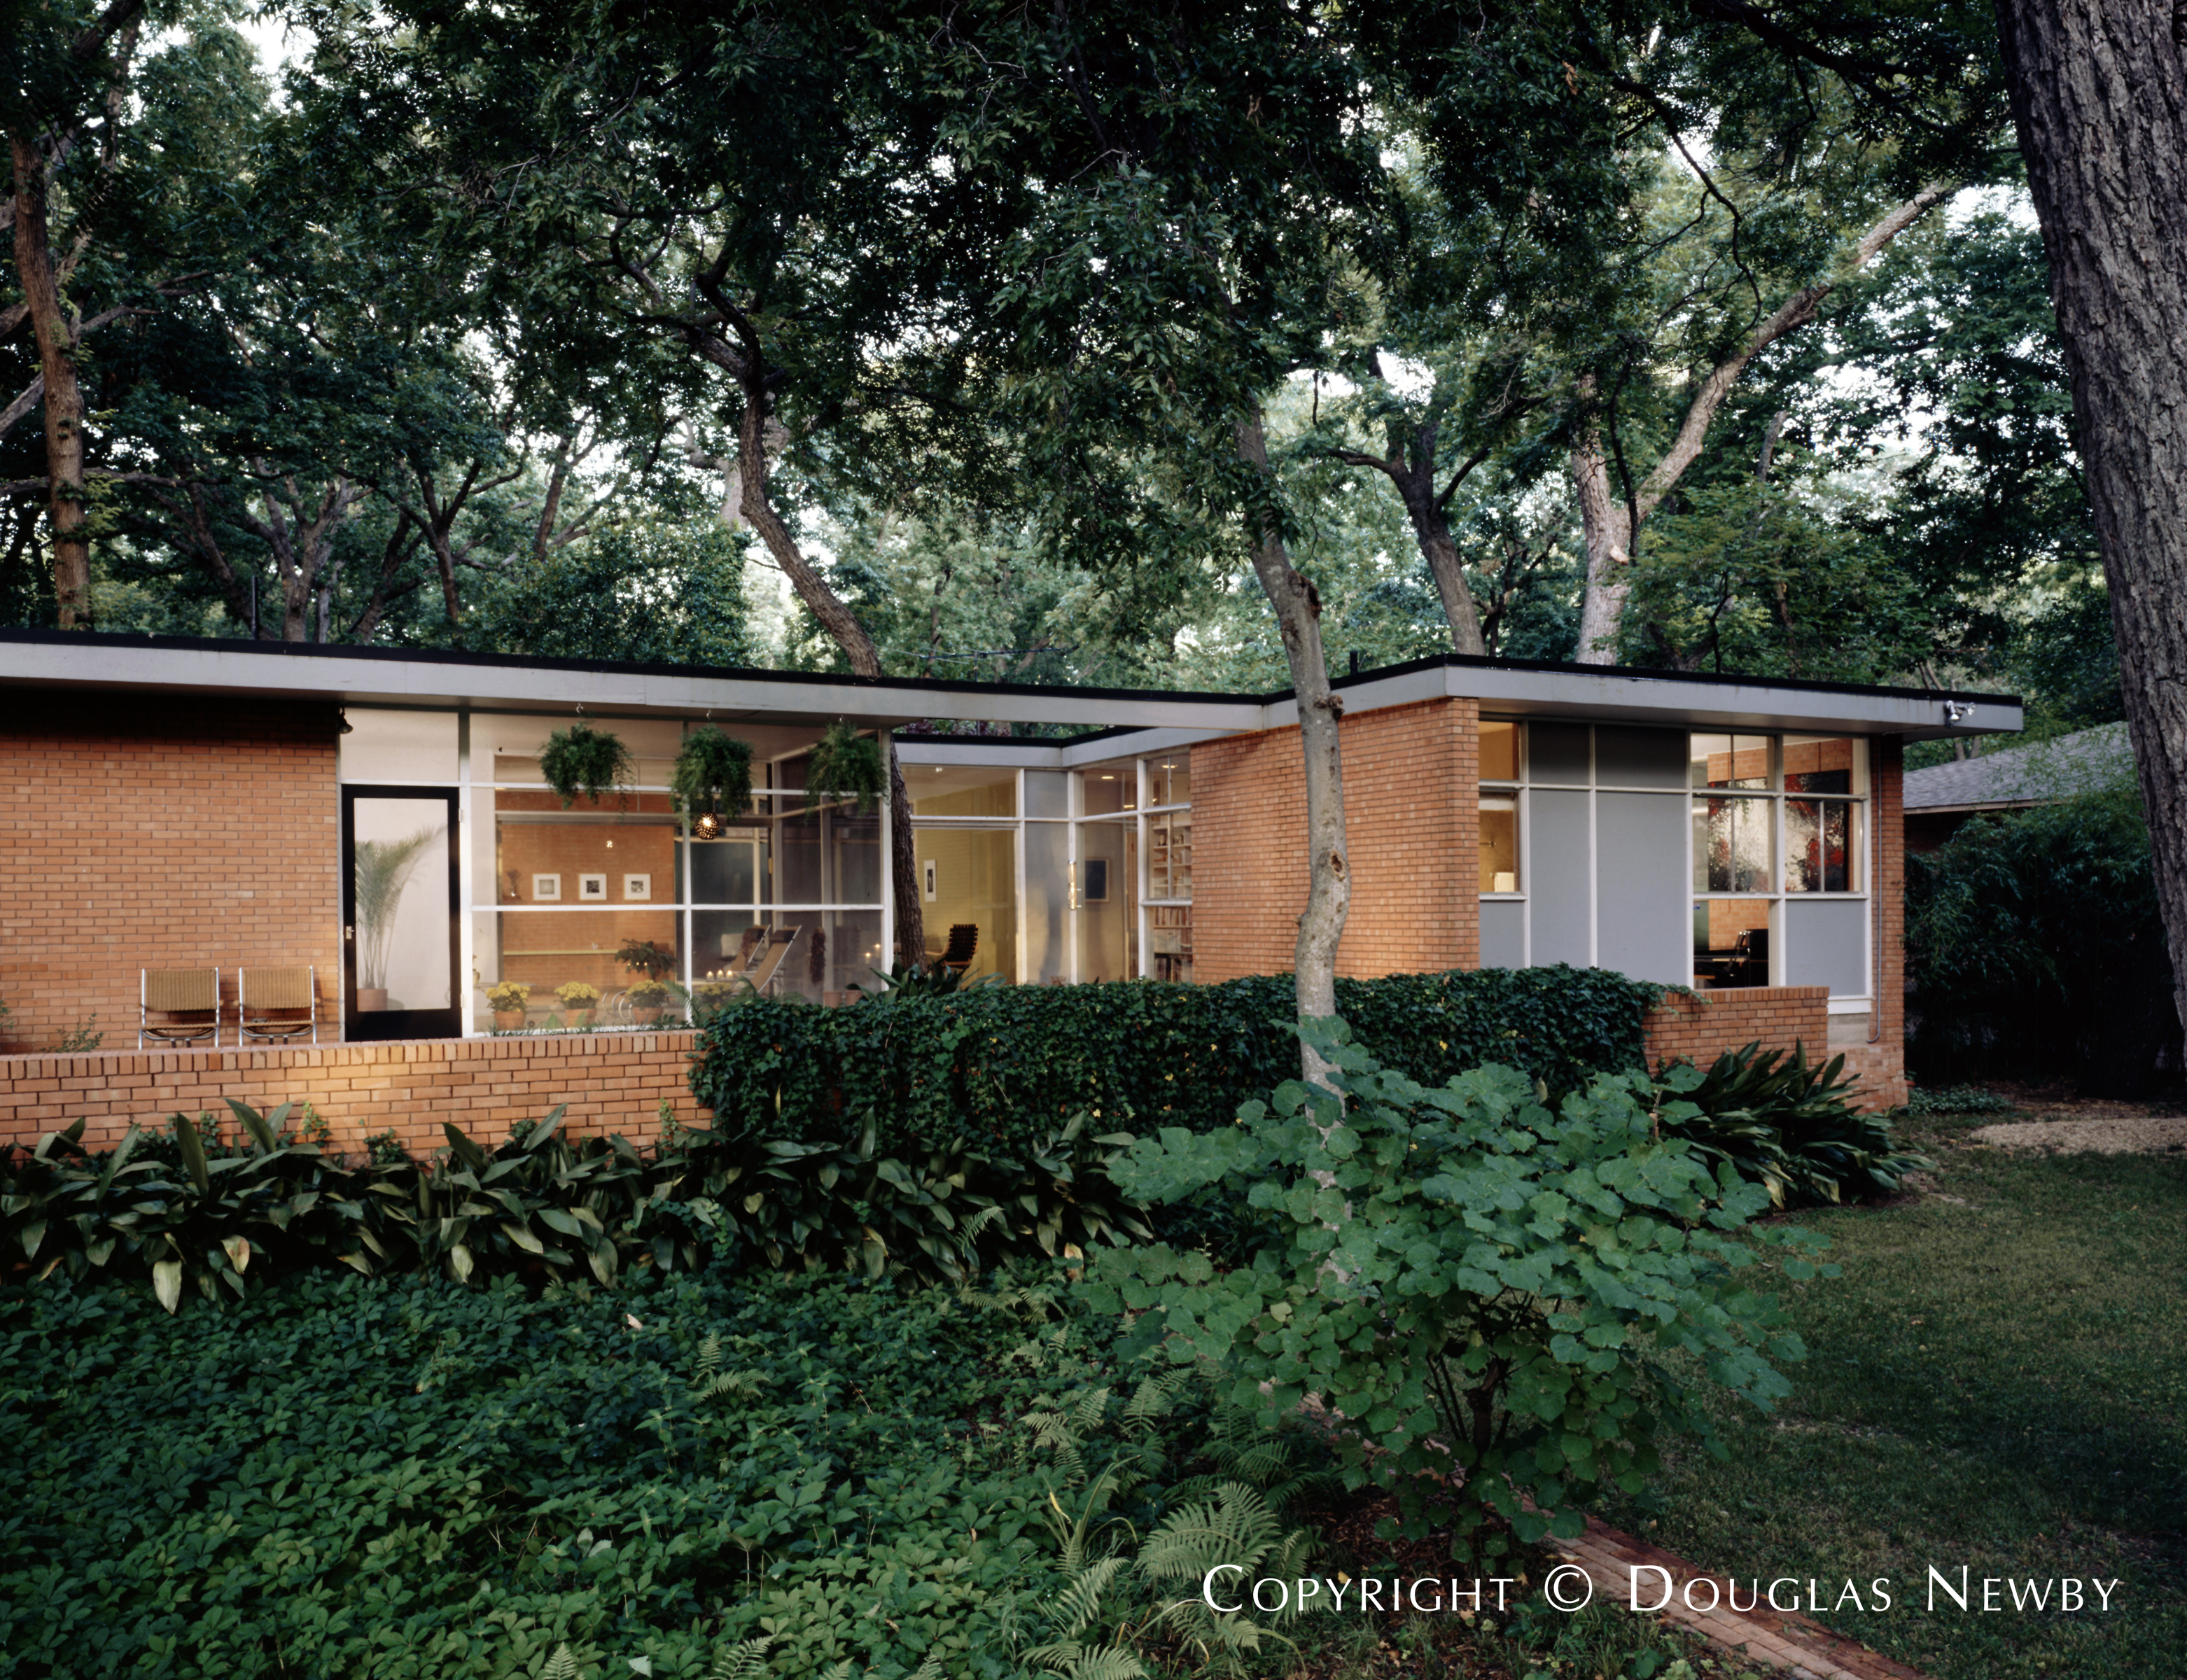 Glenn Allen Galaway Home built in the 1950s